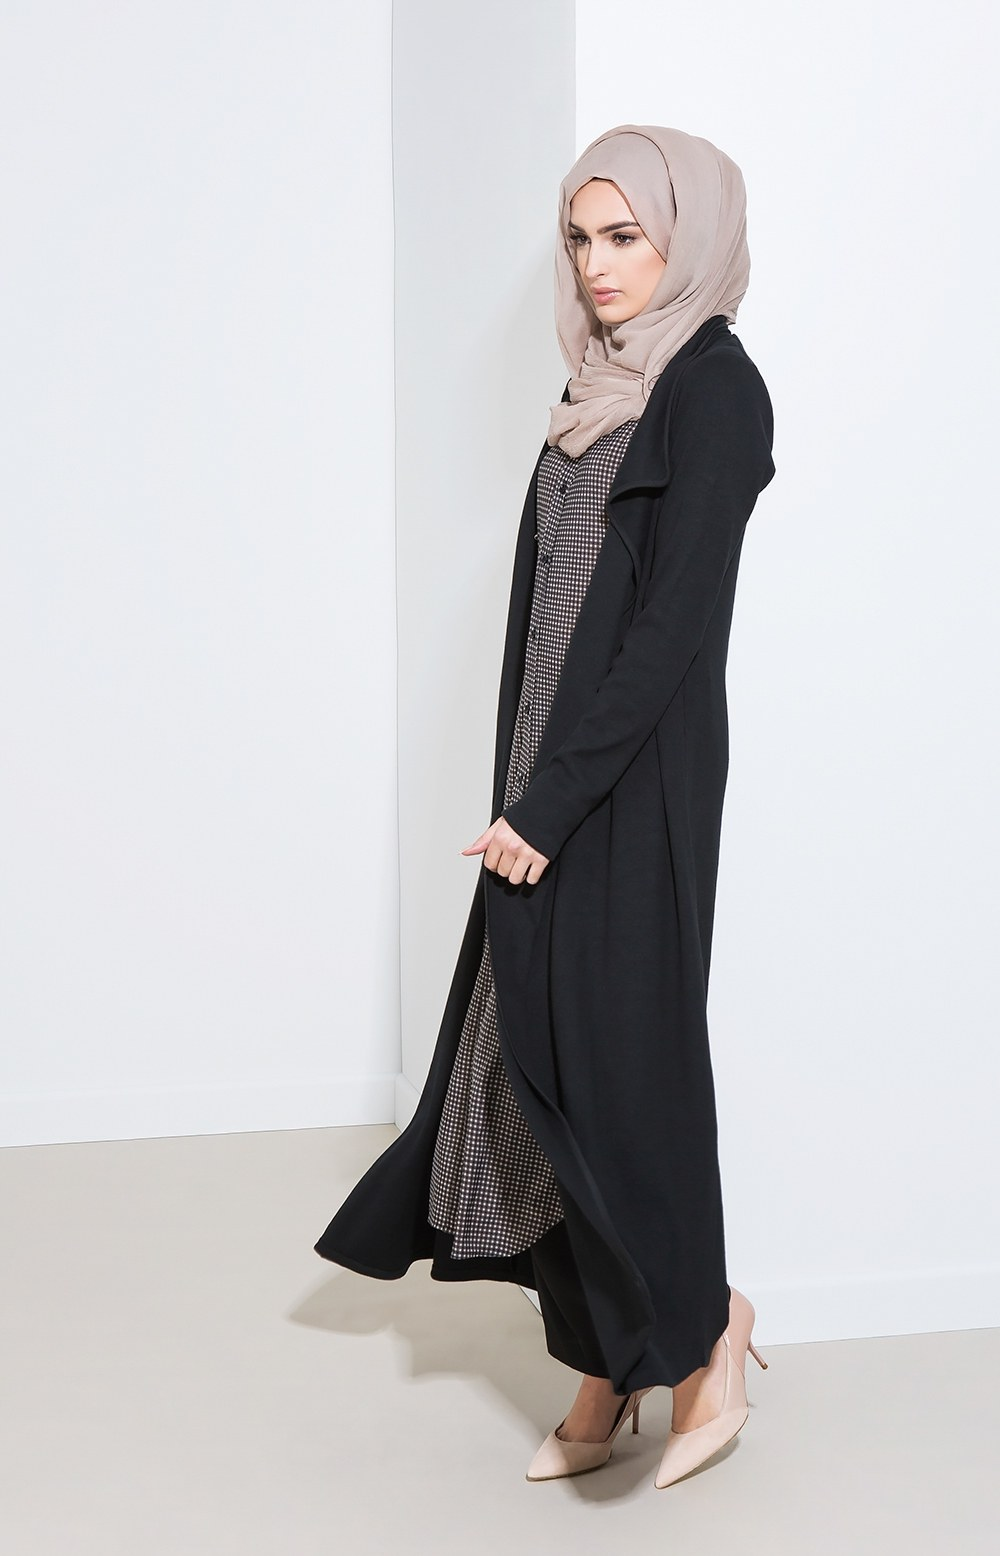 Inspirasi Model Baju Lebaran Syahrini 2017 Gdd0 25 Trend Model Baju Muslim Lebaran 2018 Simple & Modis